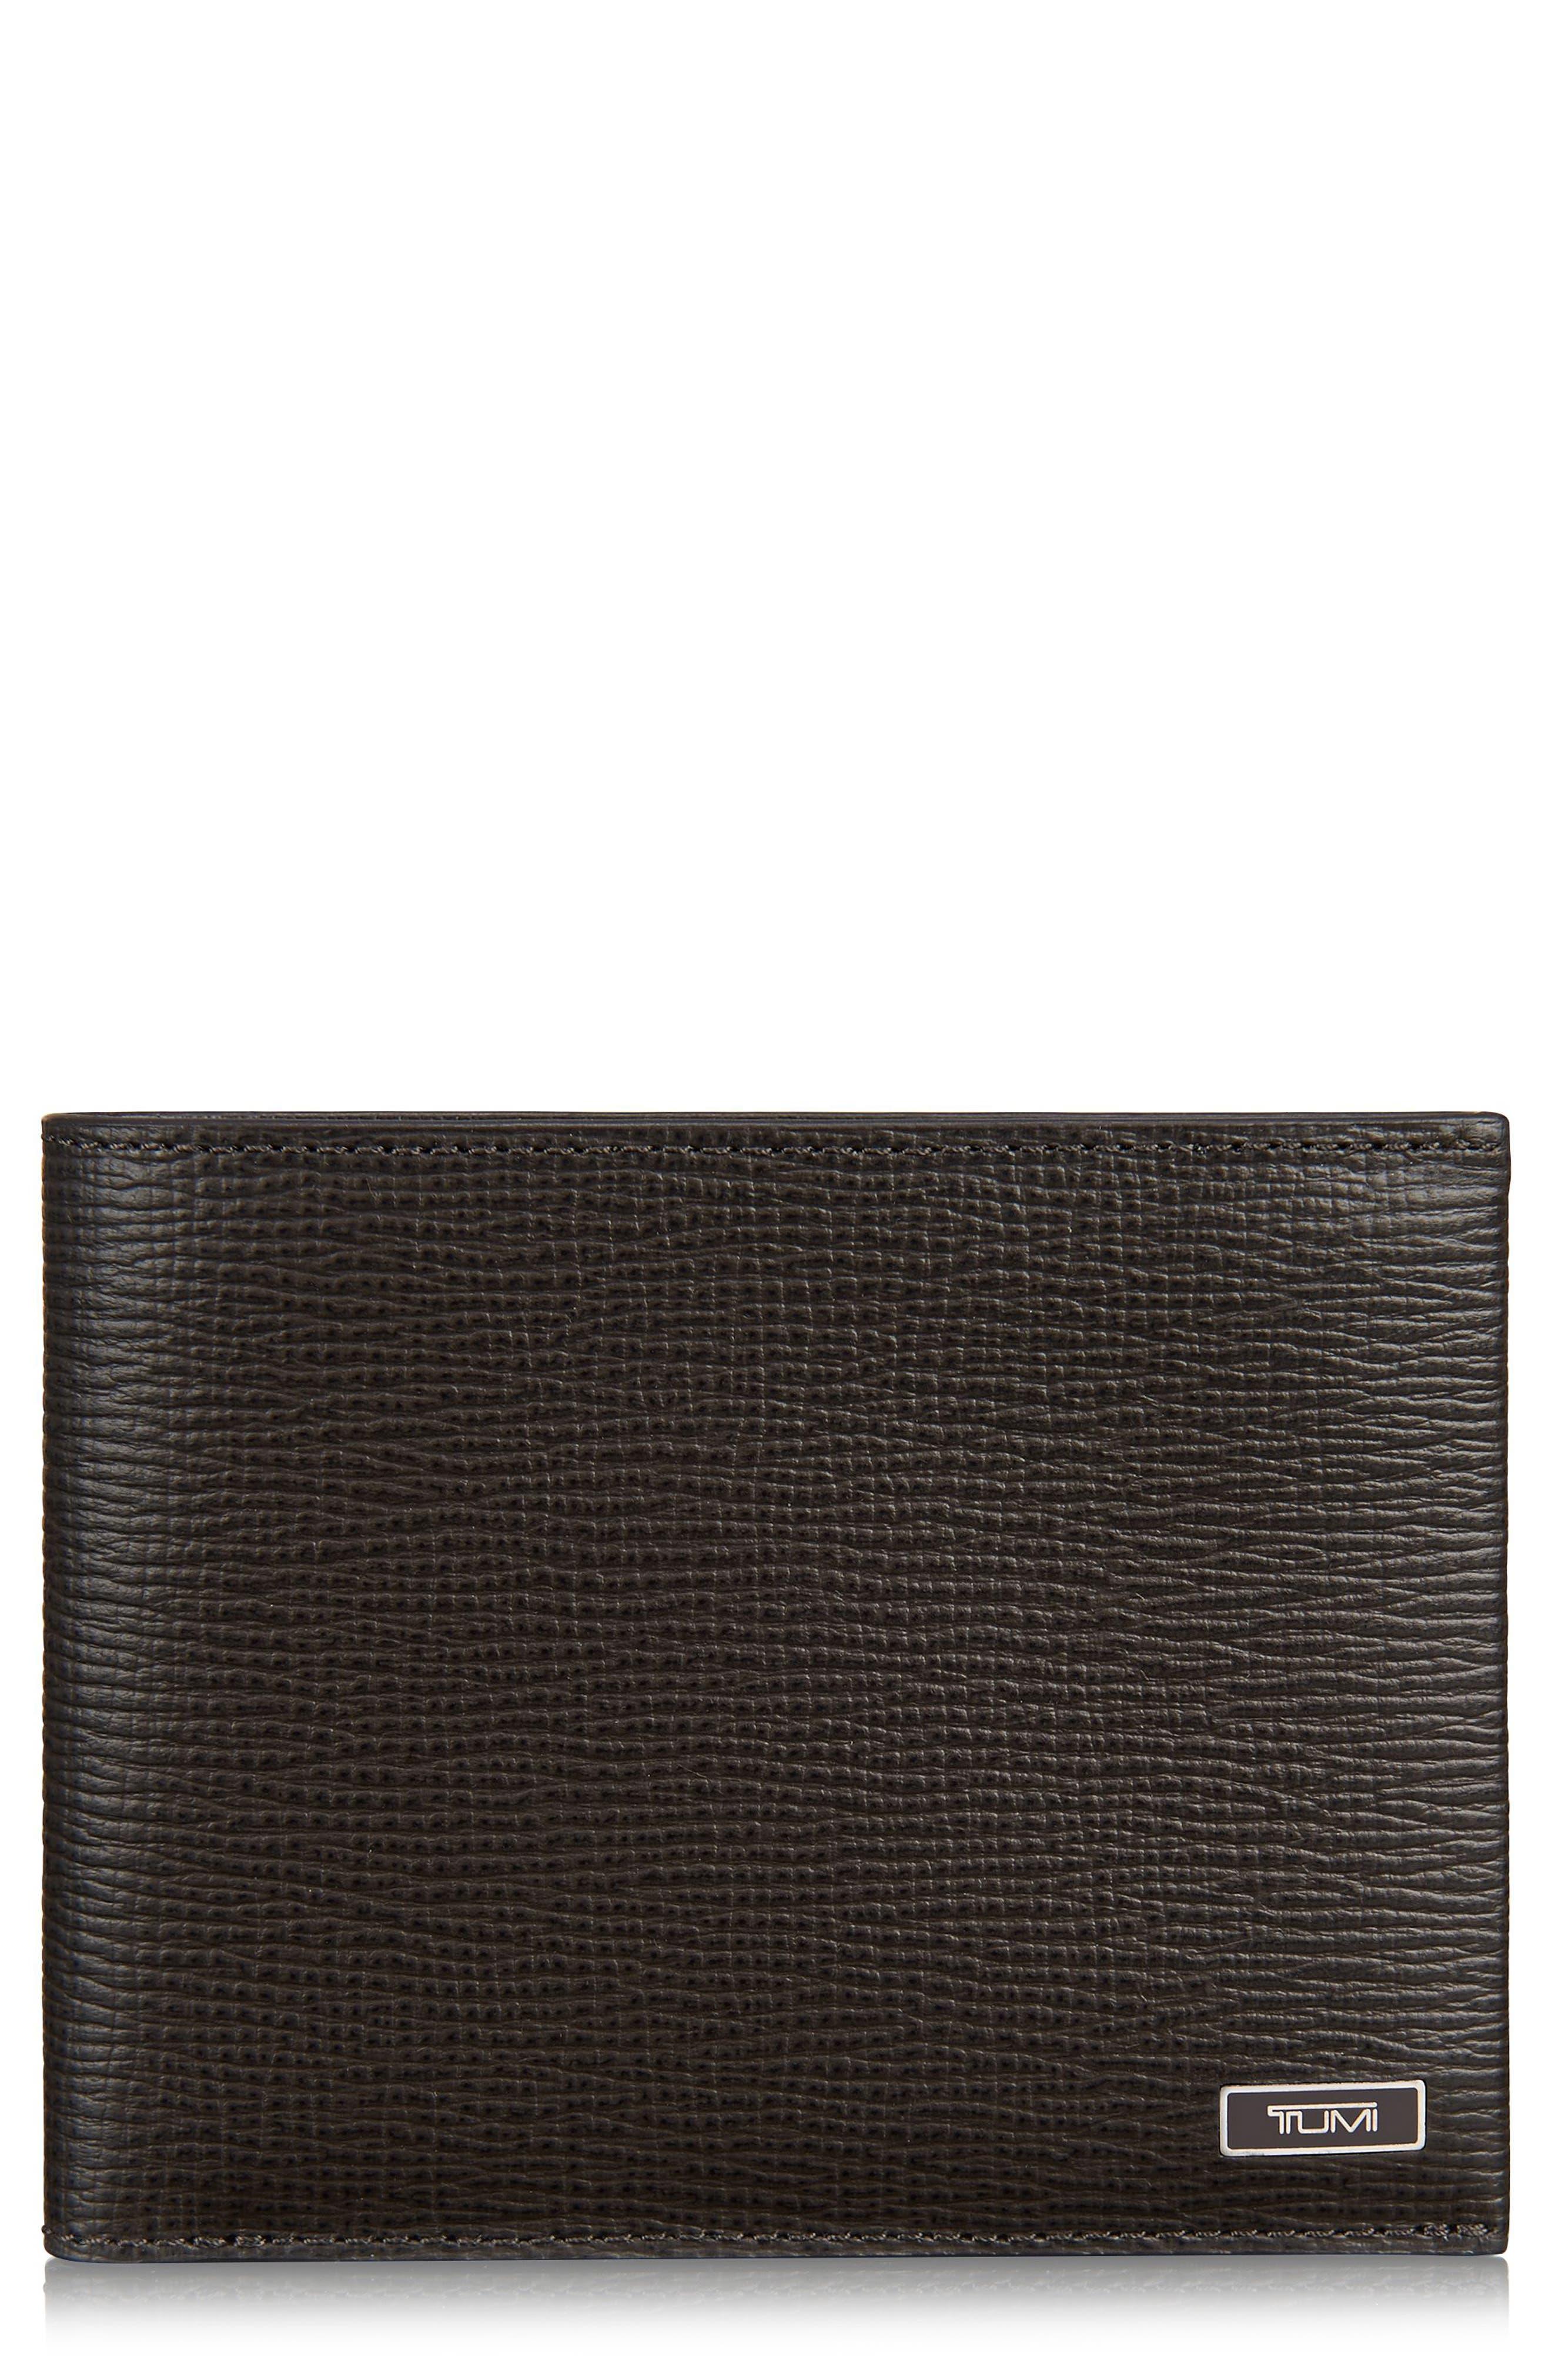 Monaco Leather Wallet,                         Main,                         color,